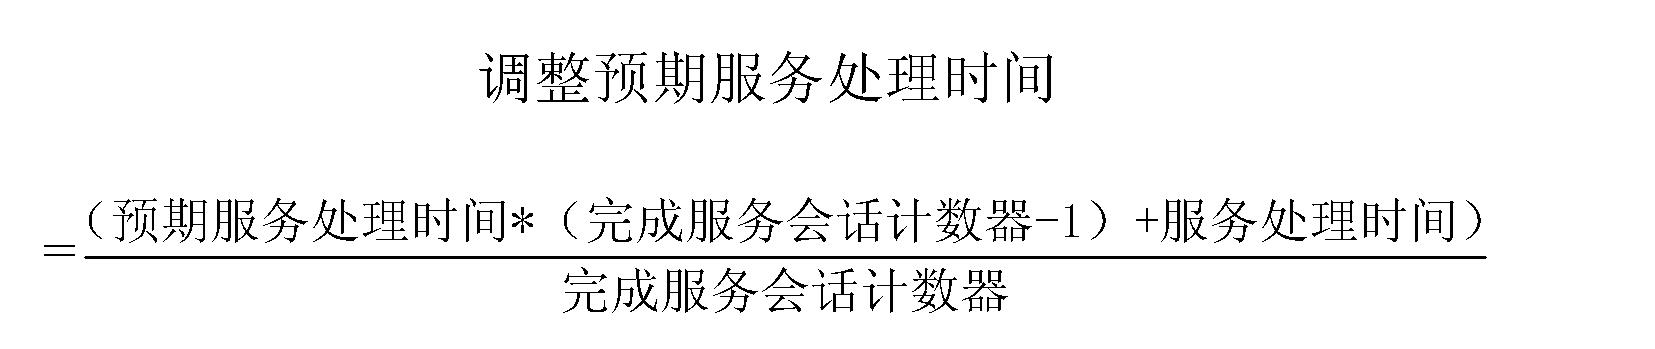 Figure CN102546590AD00101